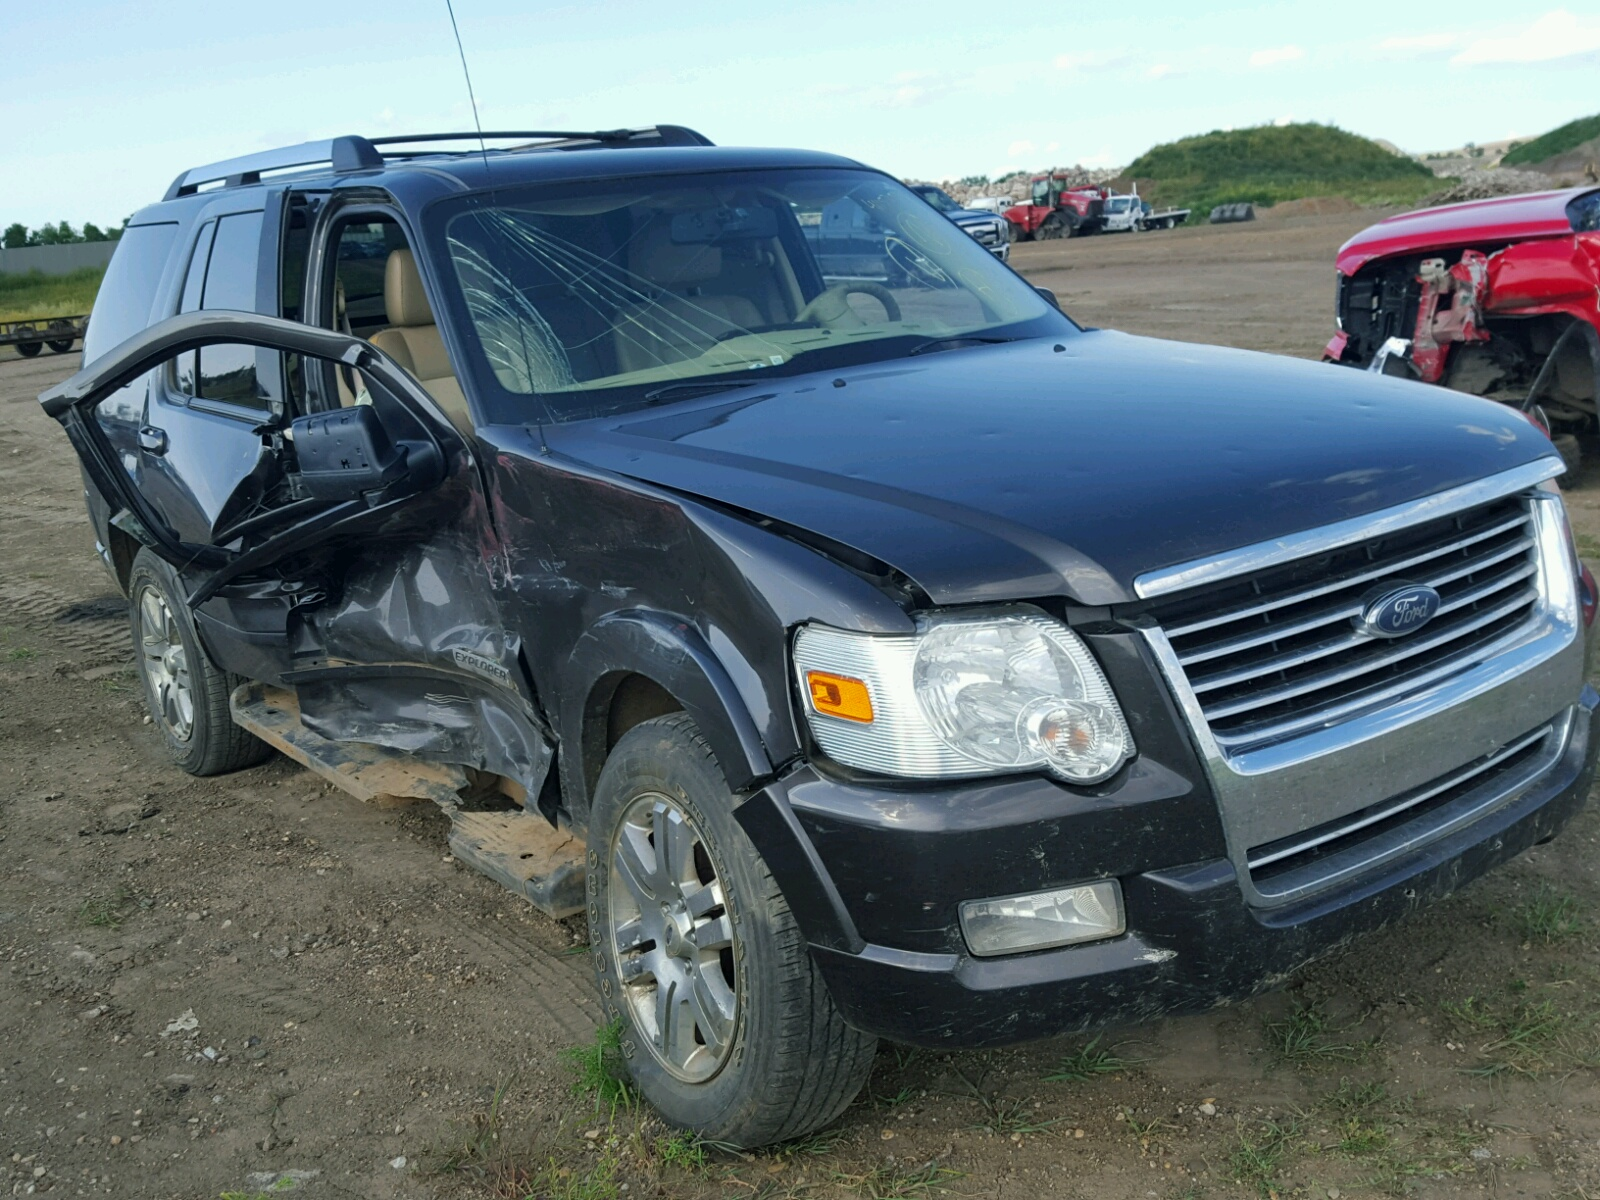 2006 Ford Explorer L for sale at Copart Billings MT Lot